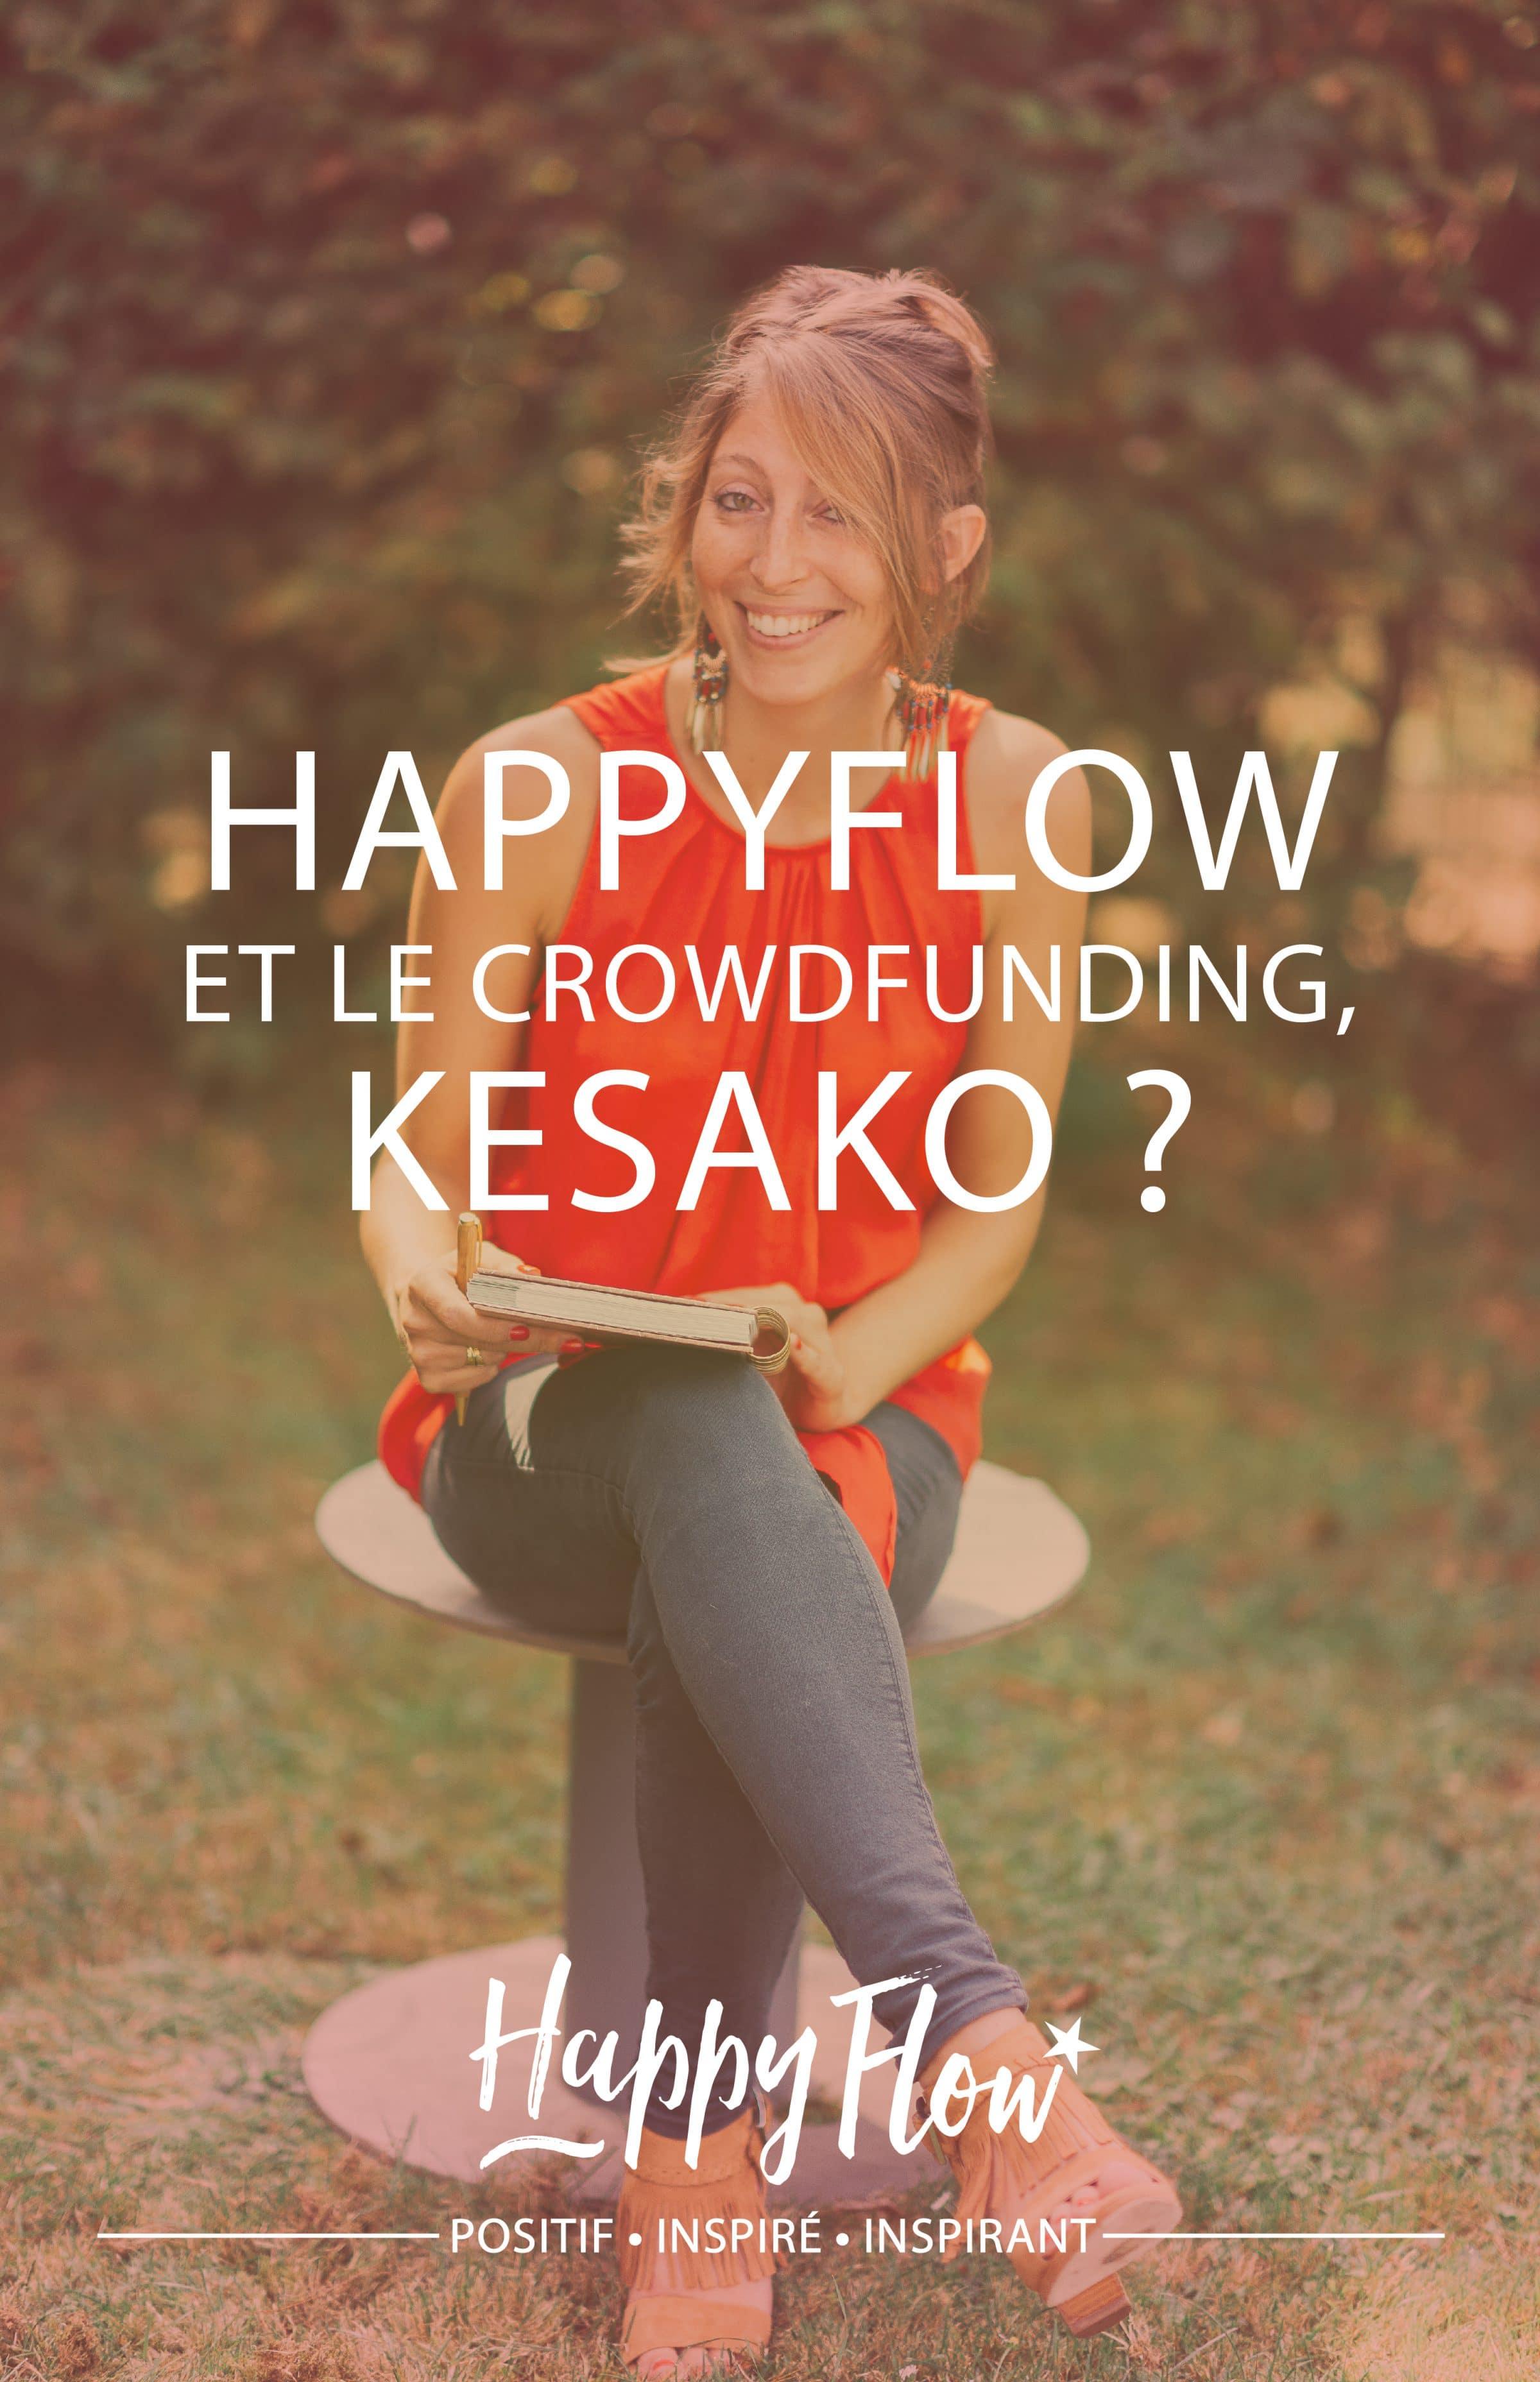 HappyFlow et le crowdfunding, KESAKO ?